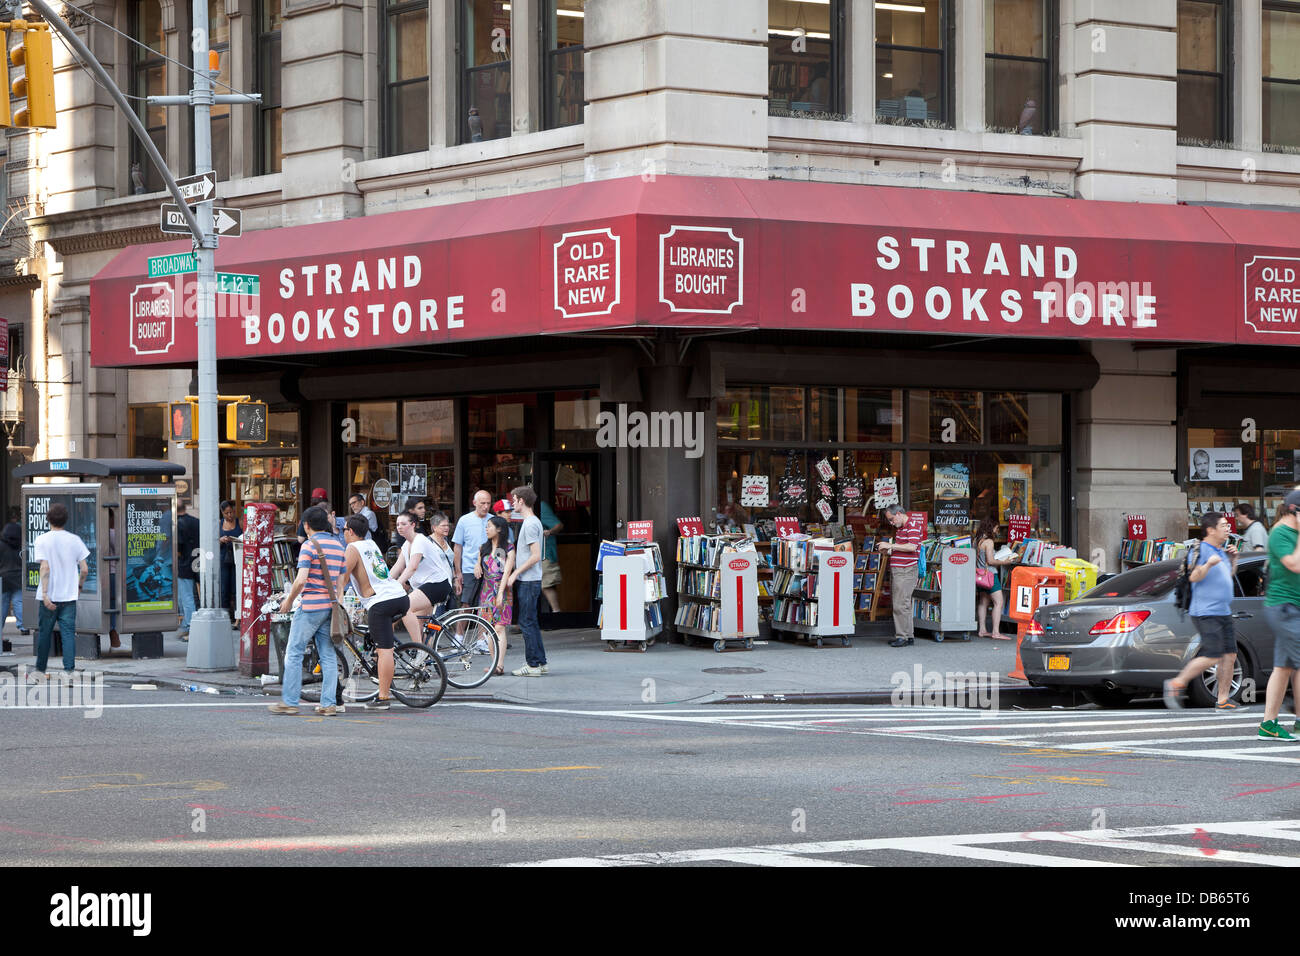 Strand Bookstore on Broadway, New York City - Stock Image